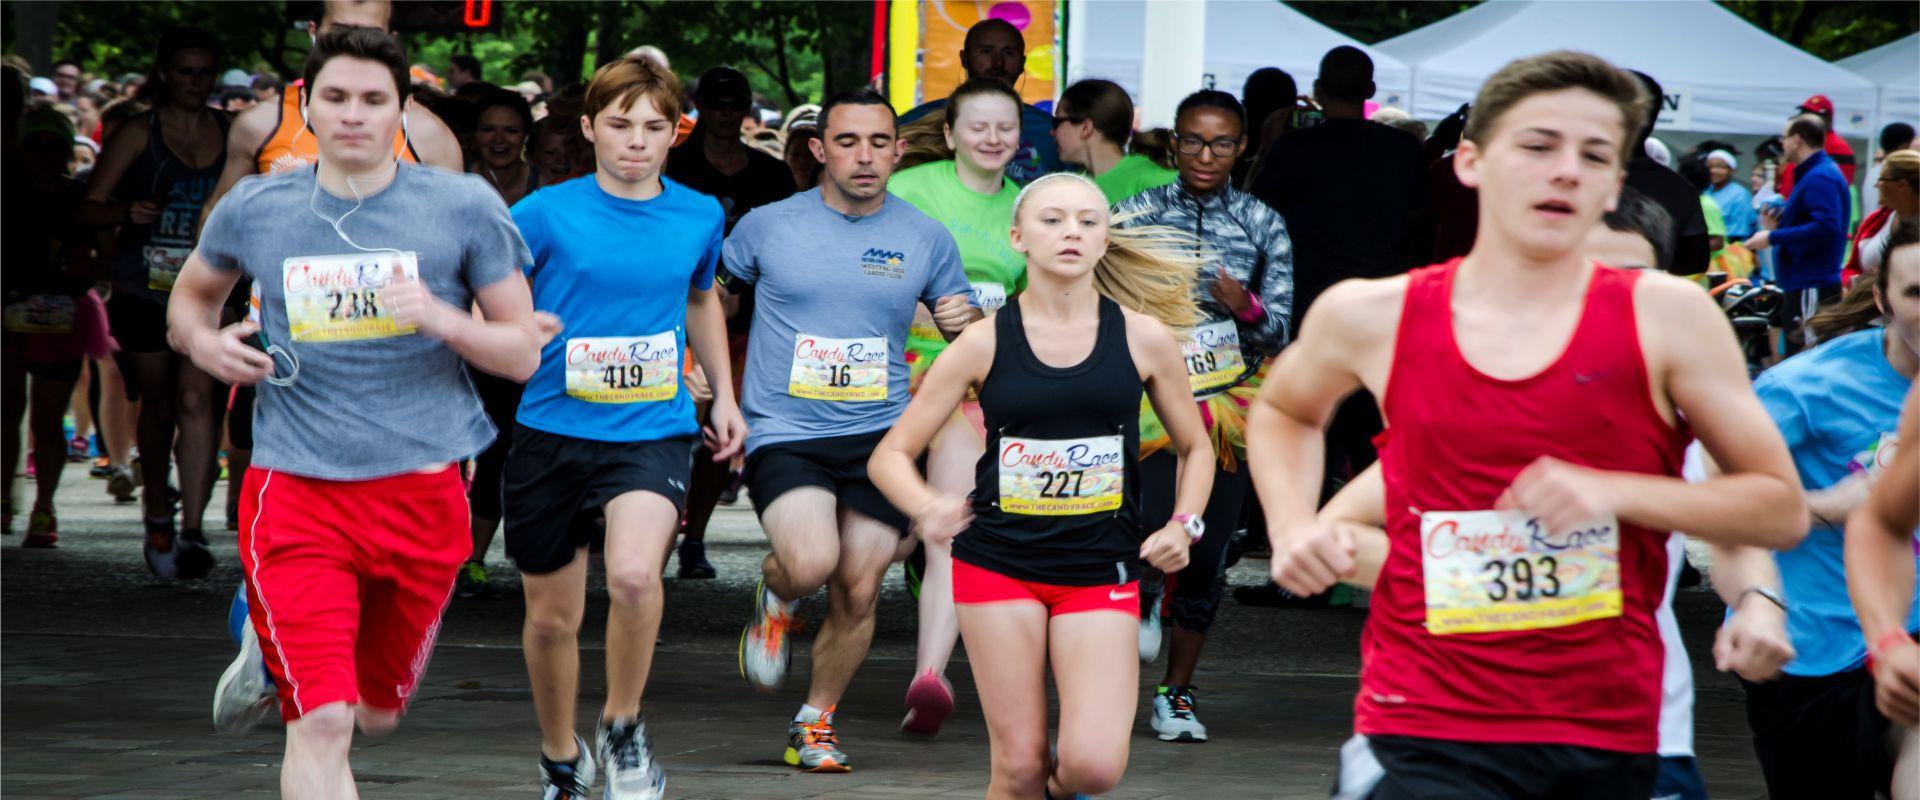 Candy Race 5k Columbus